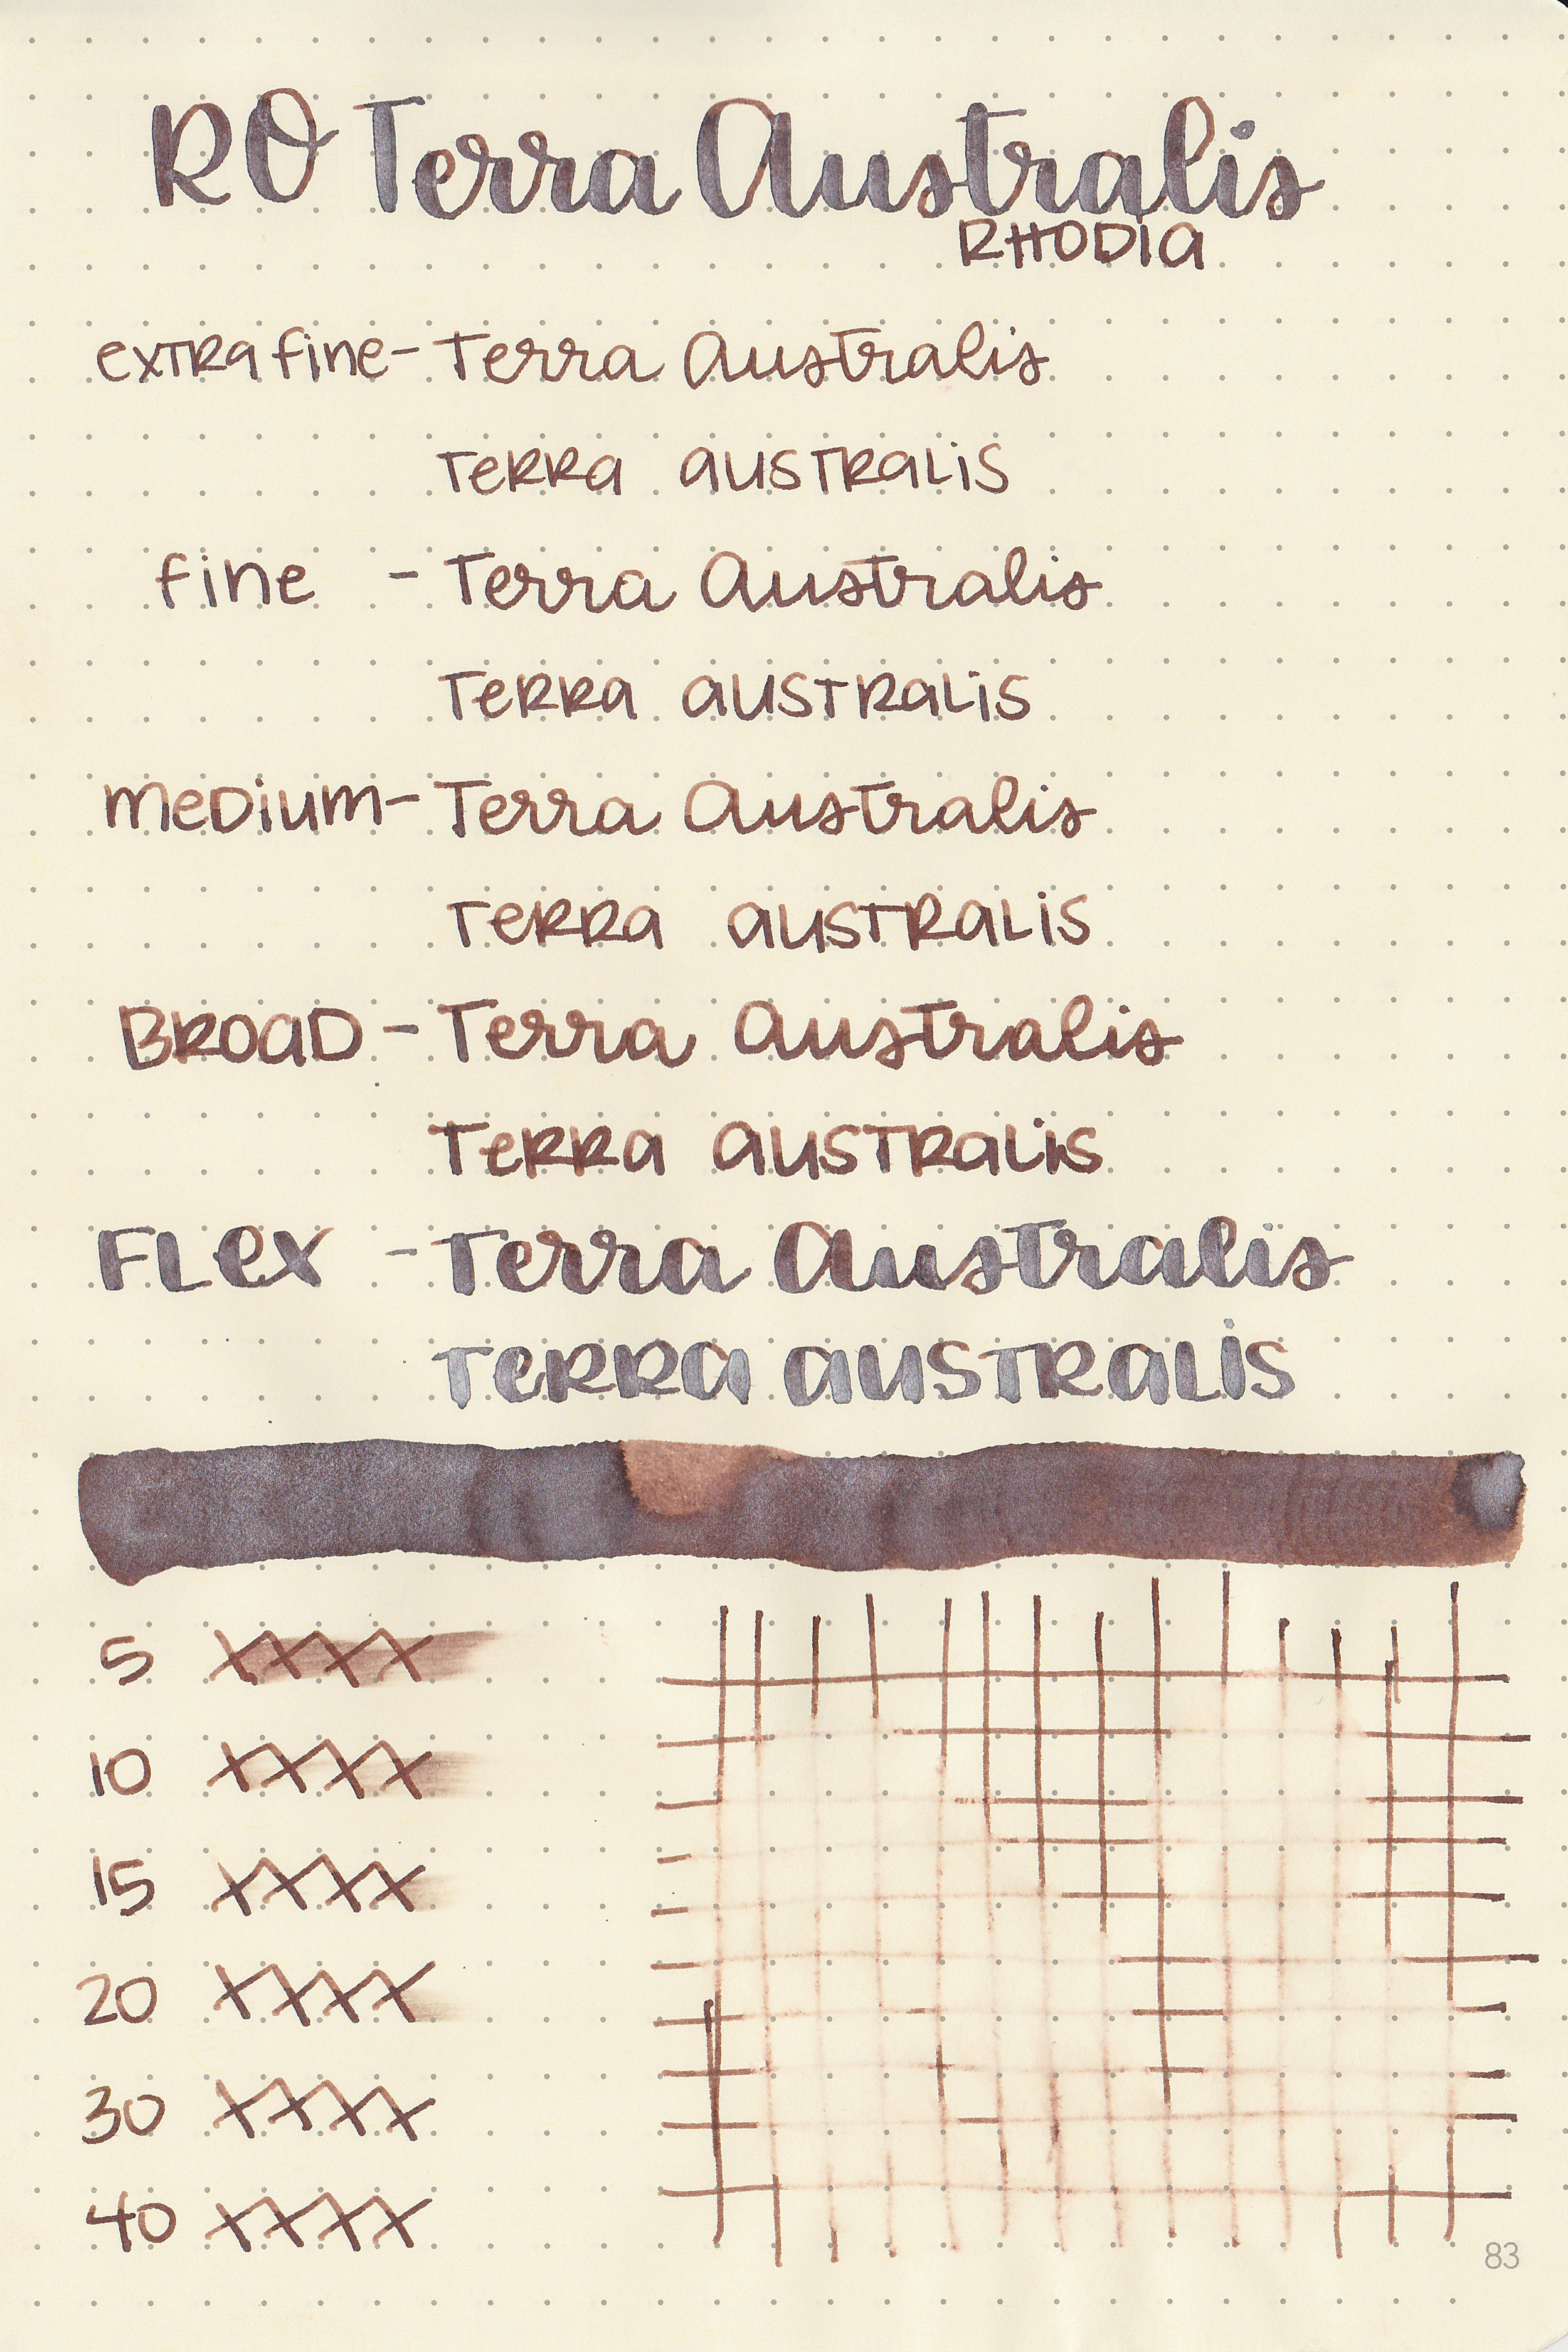 ro-terra-australis-15.jpg